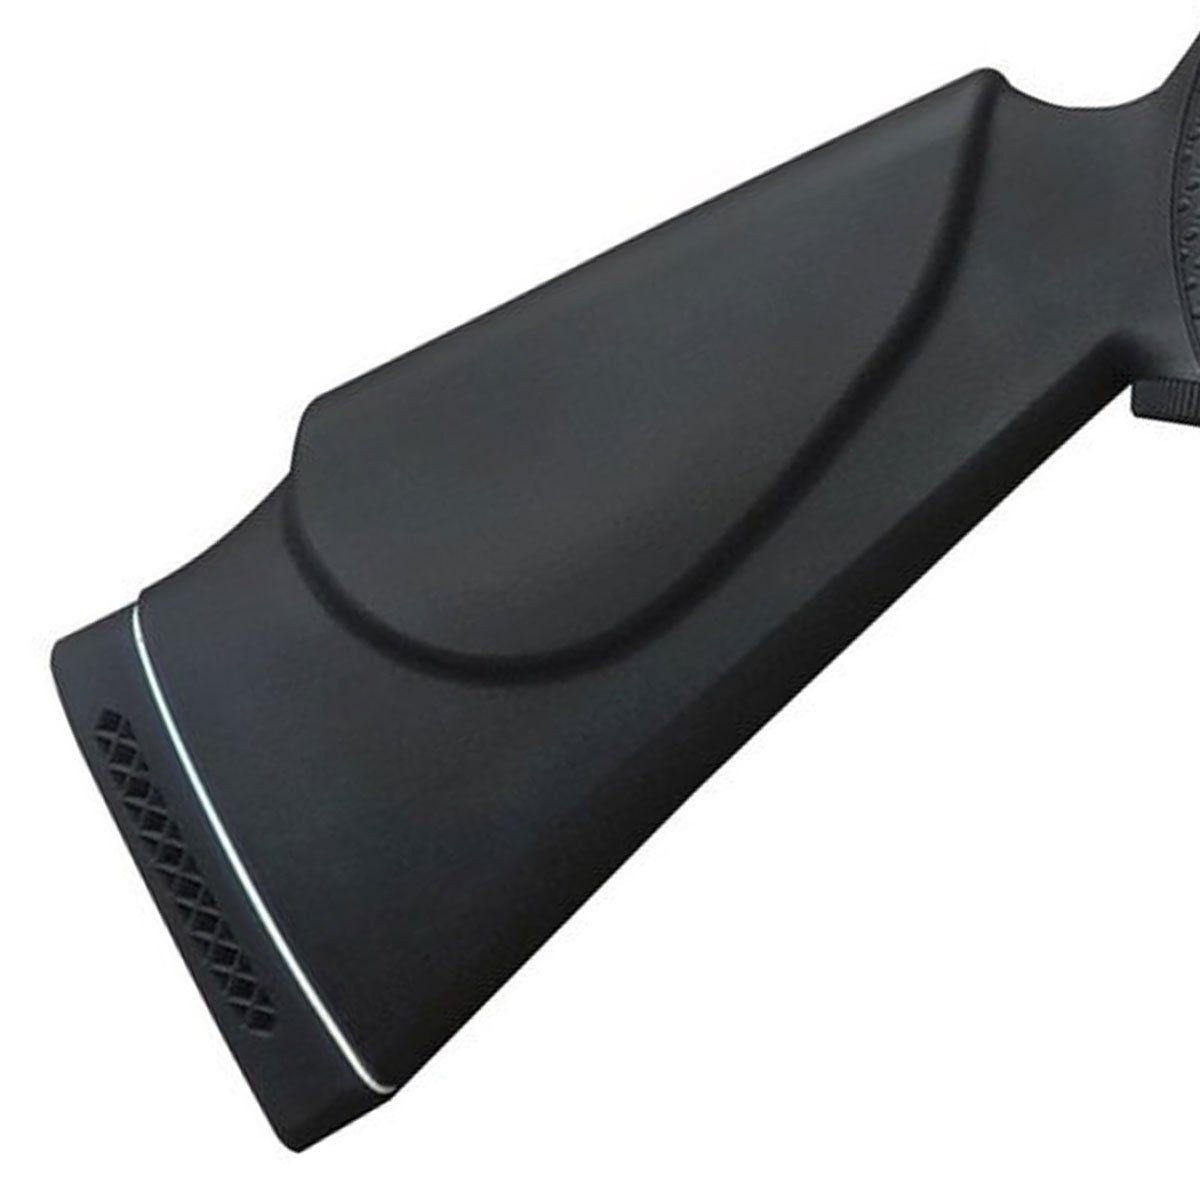 Carabina de Pressão Rossi Nova Dione Spring 5,5mm